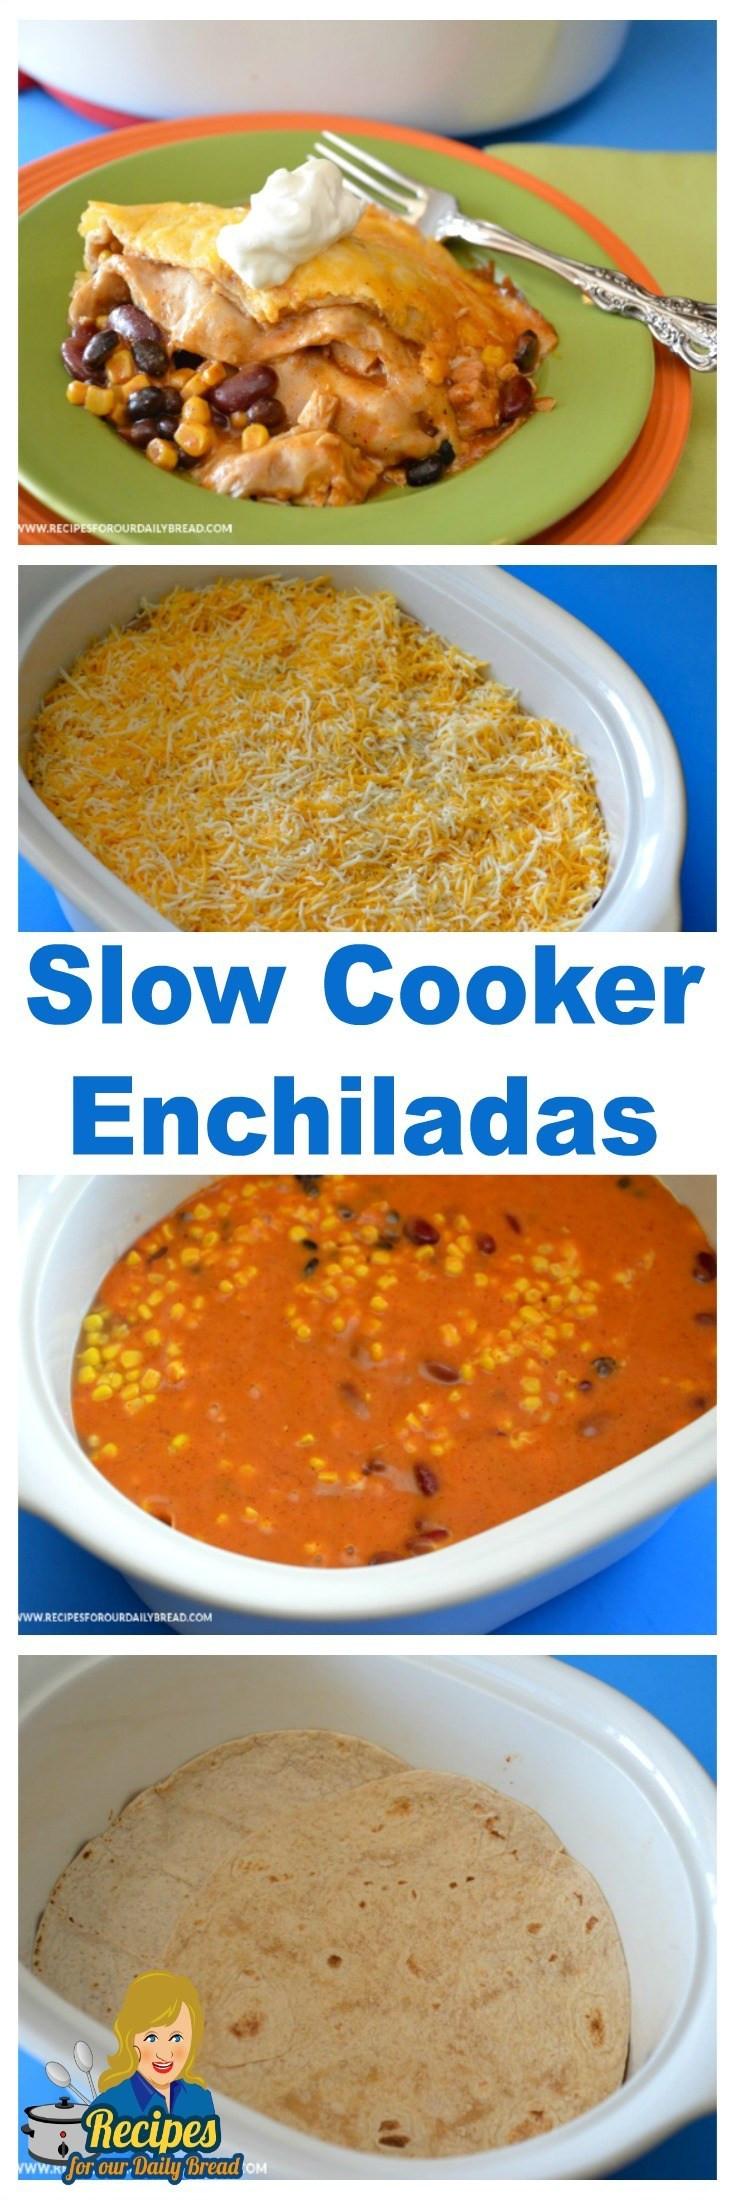 Crock Pot Chicken Enchiladas  Crock Pot Chicken Enchiladas – Page 2 – Recipes For Our